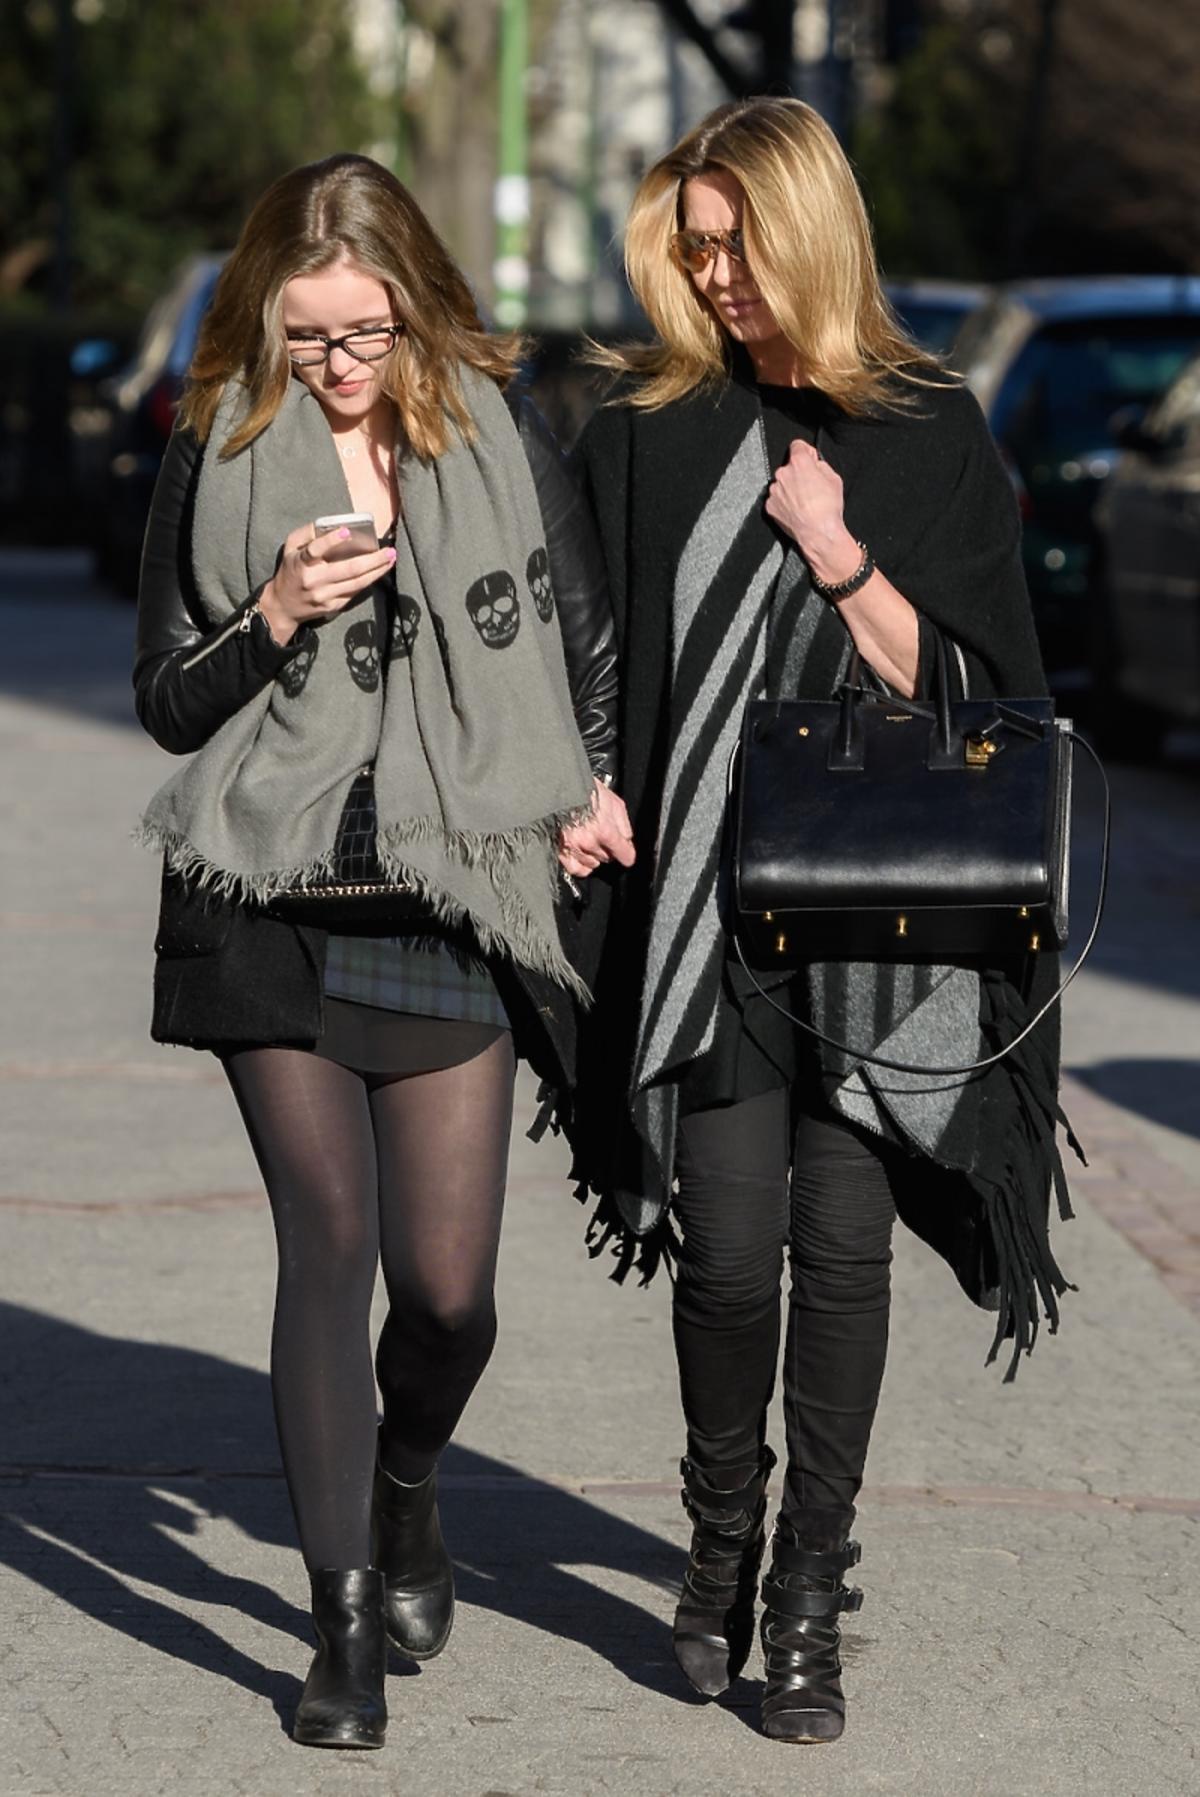 Hanna Lis z córką Anną na ulicy